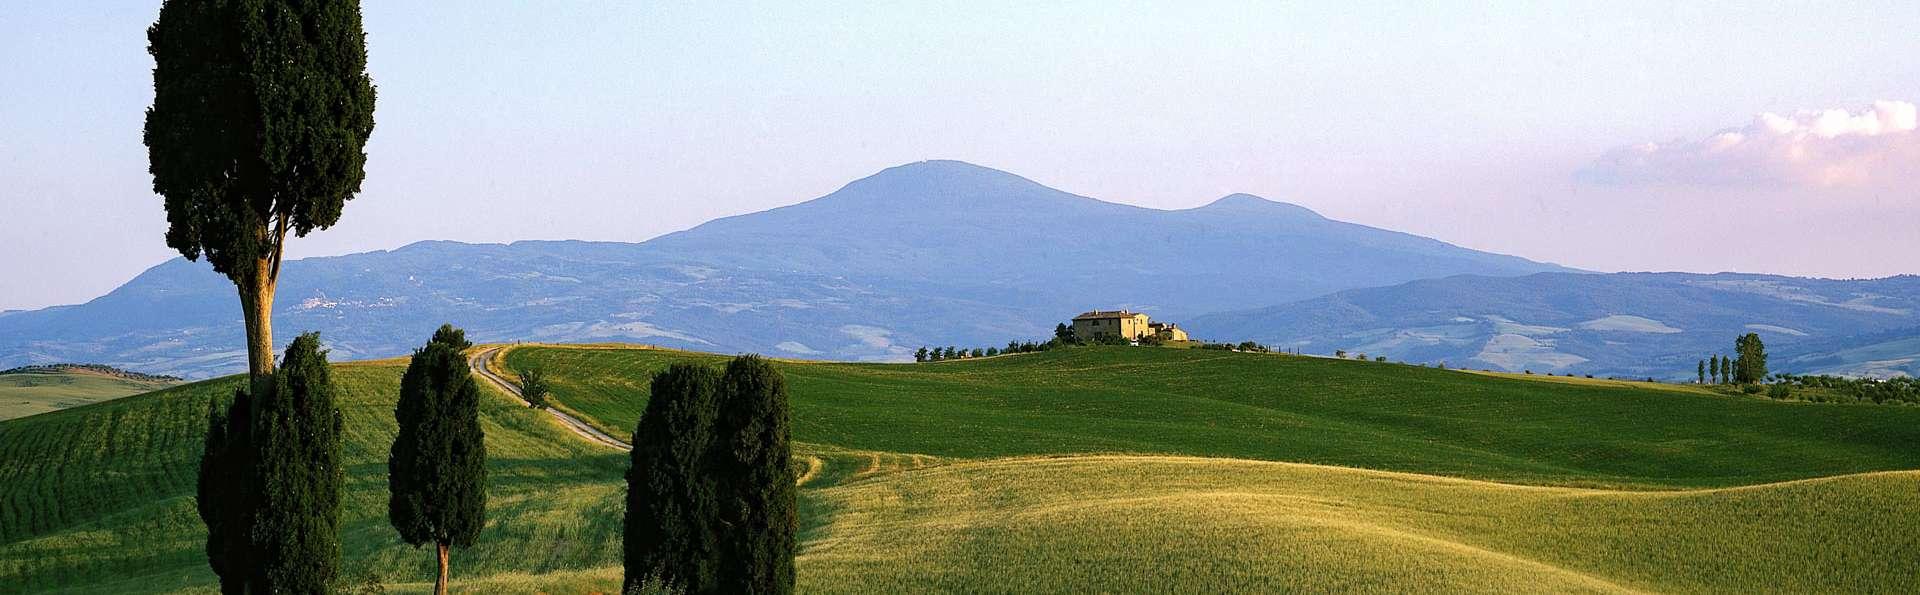 Giardino Segreto - Historic Capitano Collection - EDIT_VAL_D_ORCIA_03.jpg